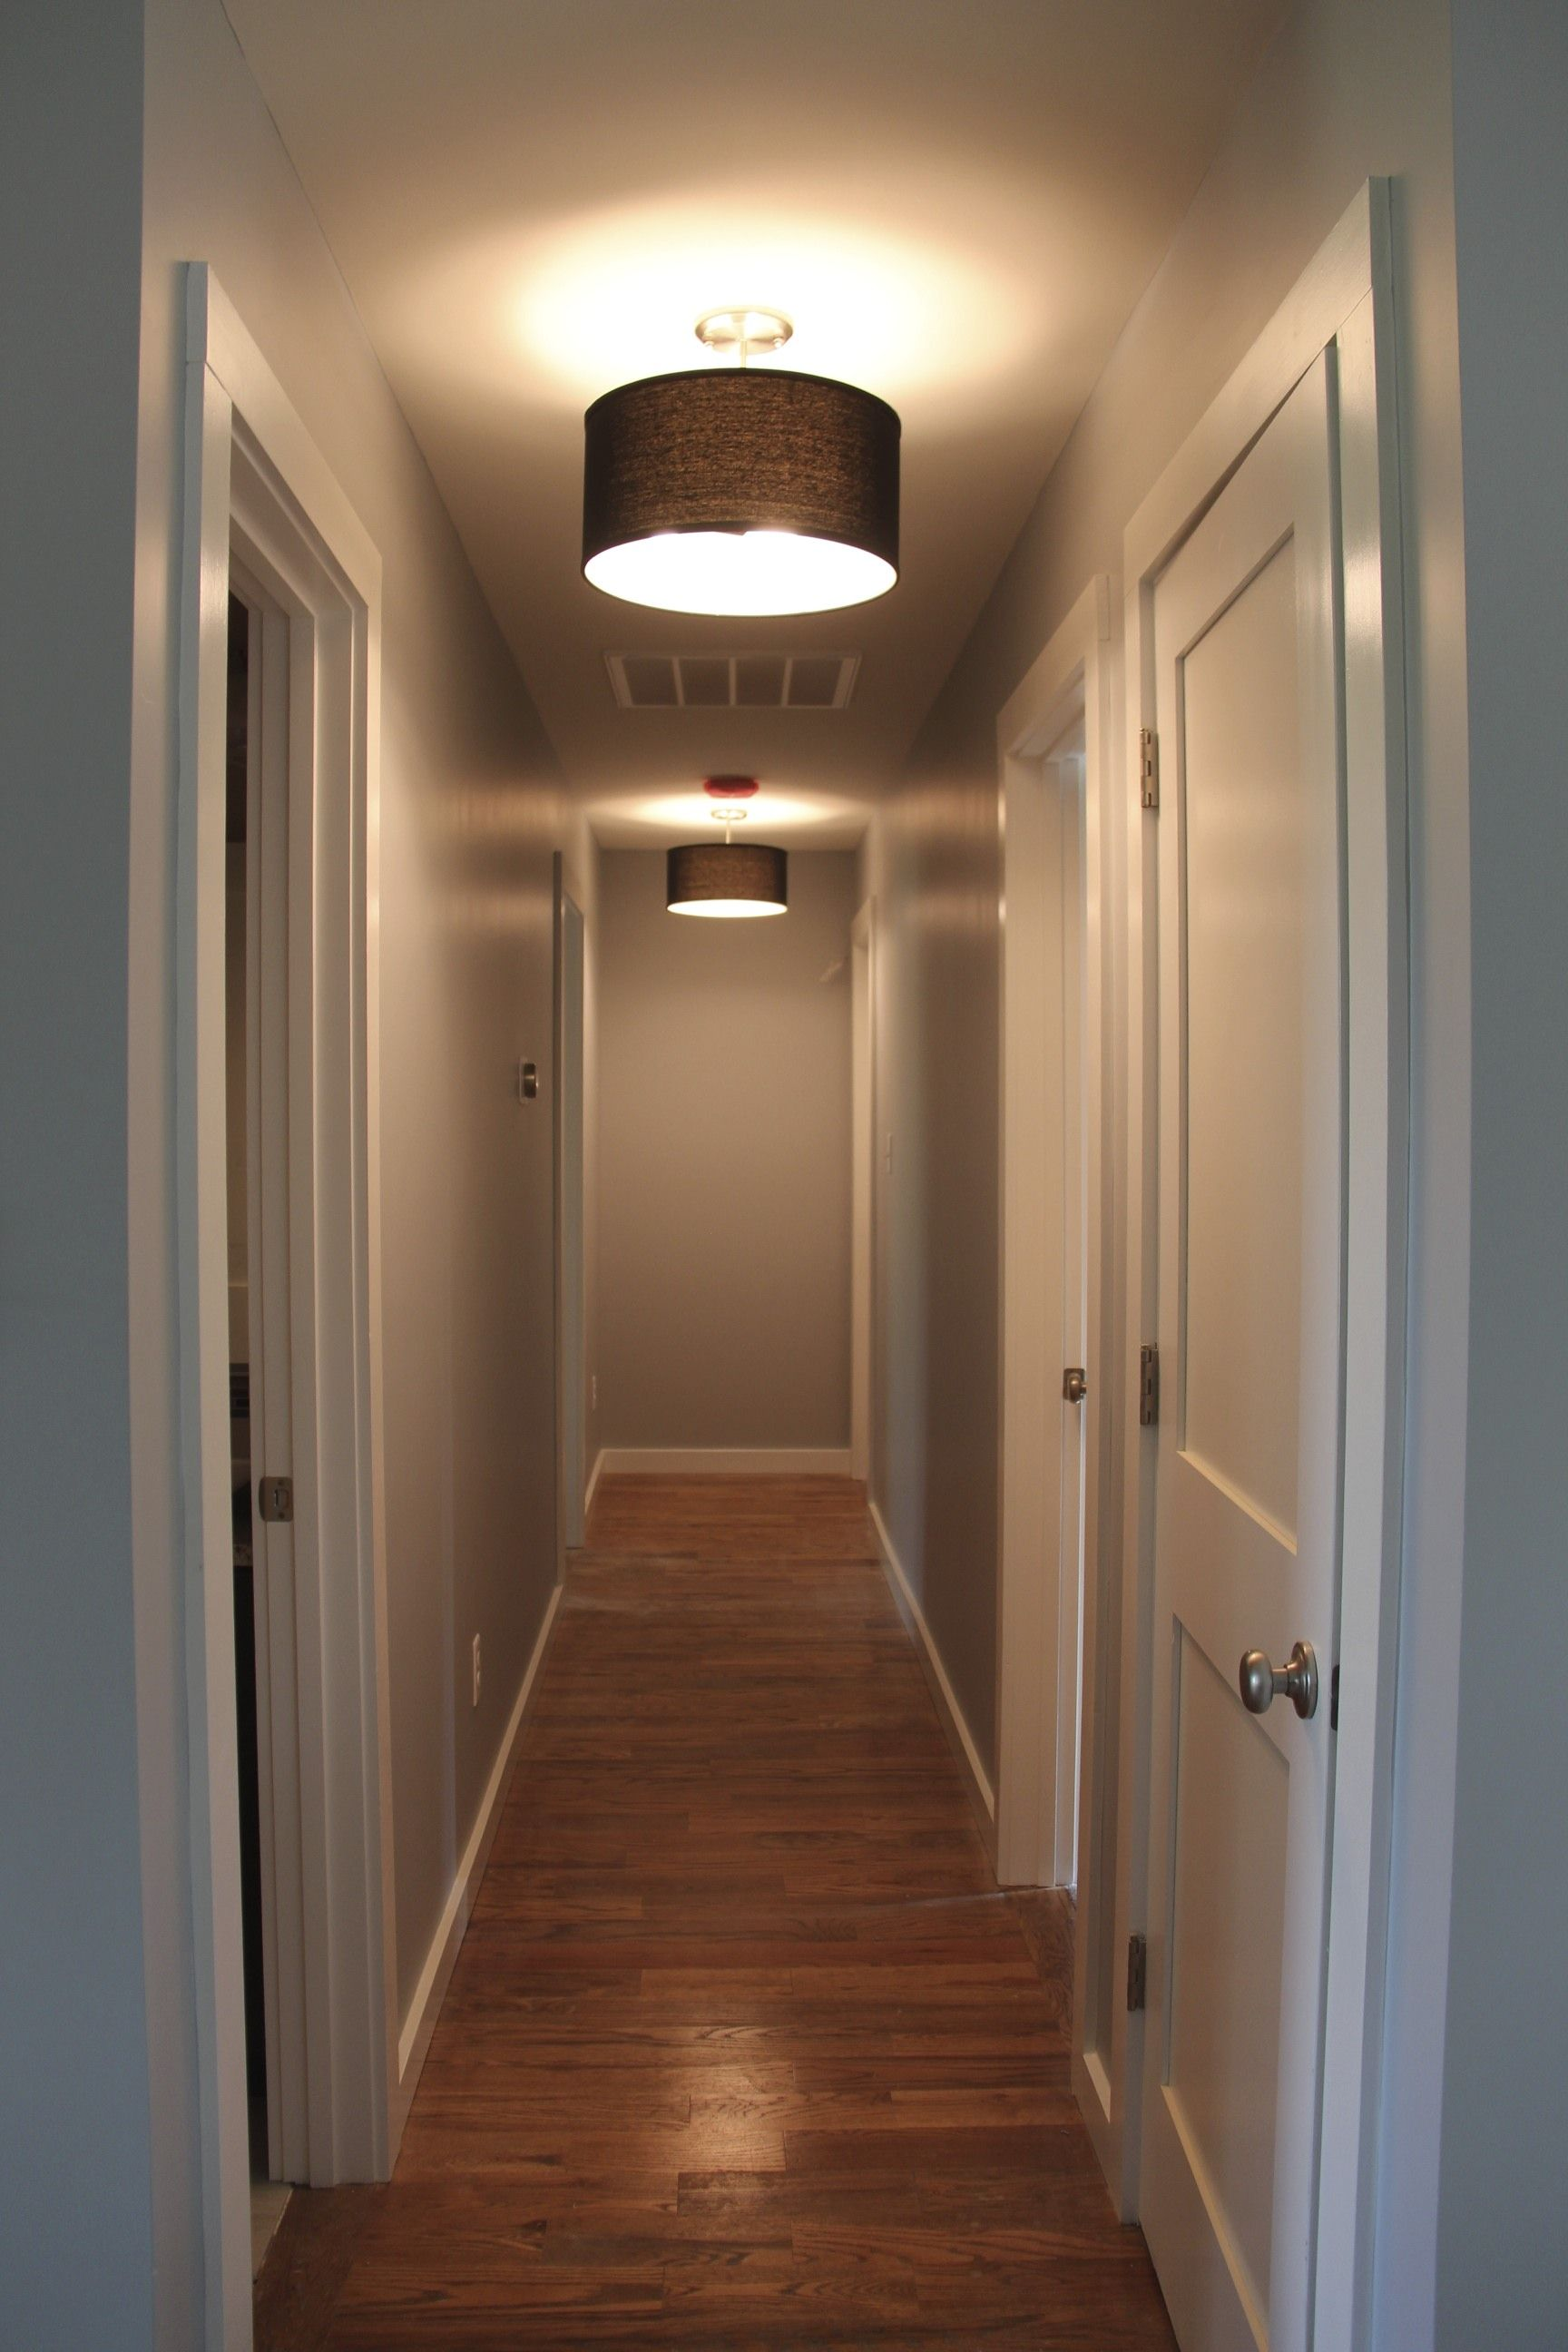 Inspiration Lighting 20 Flagrant Hallway Lighting For Wall And